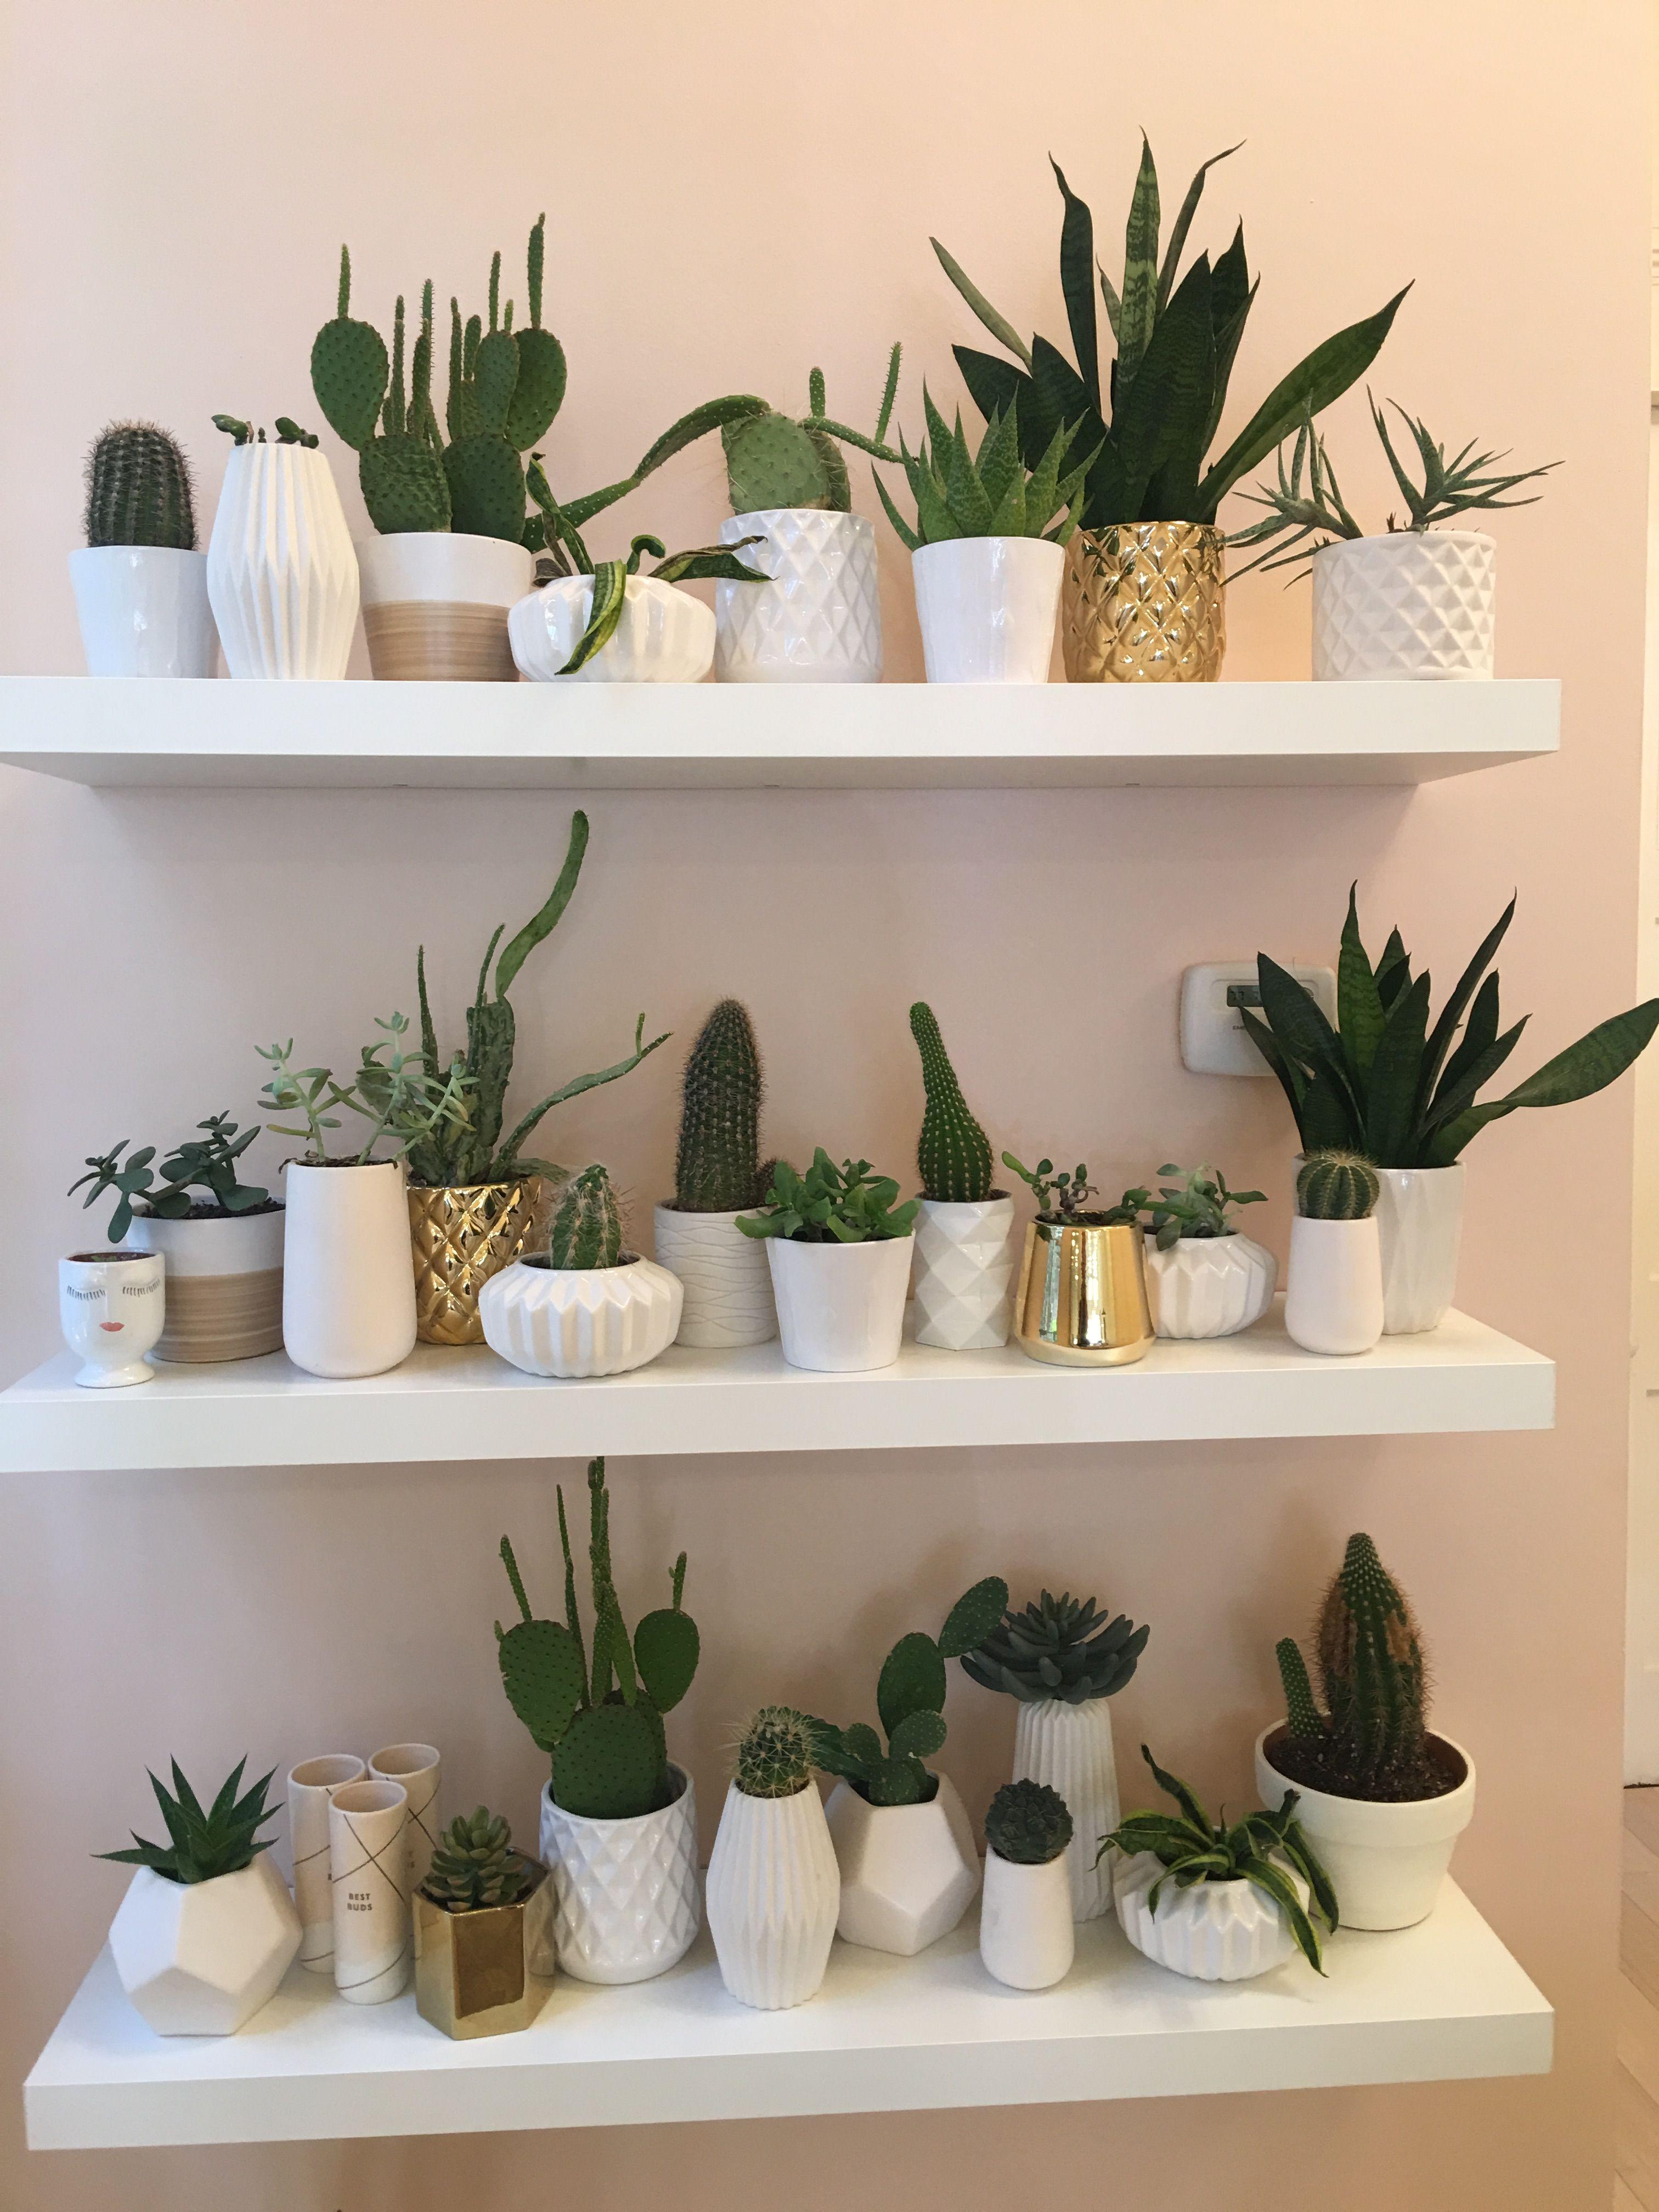 @followingsunshine_ On Instagram #wallgoals #goals #cactus